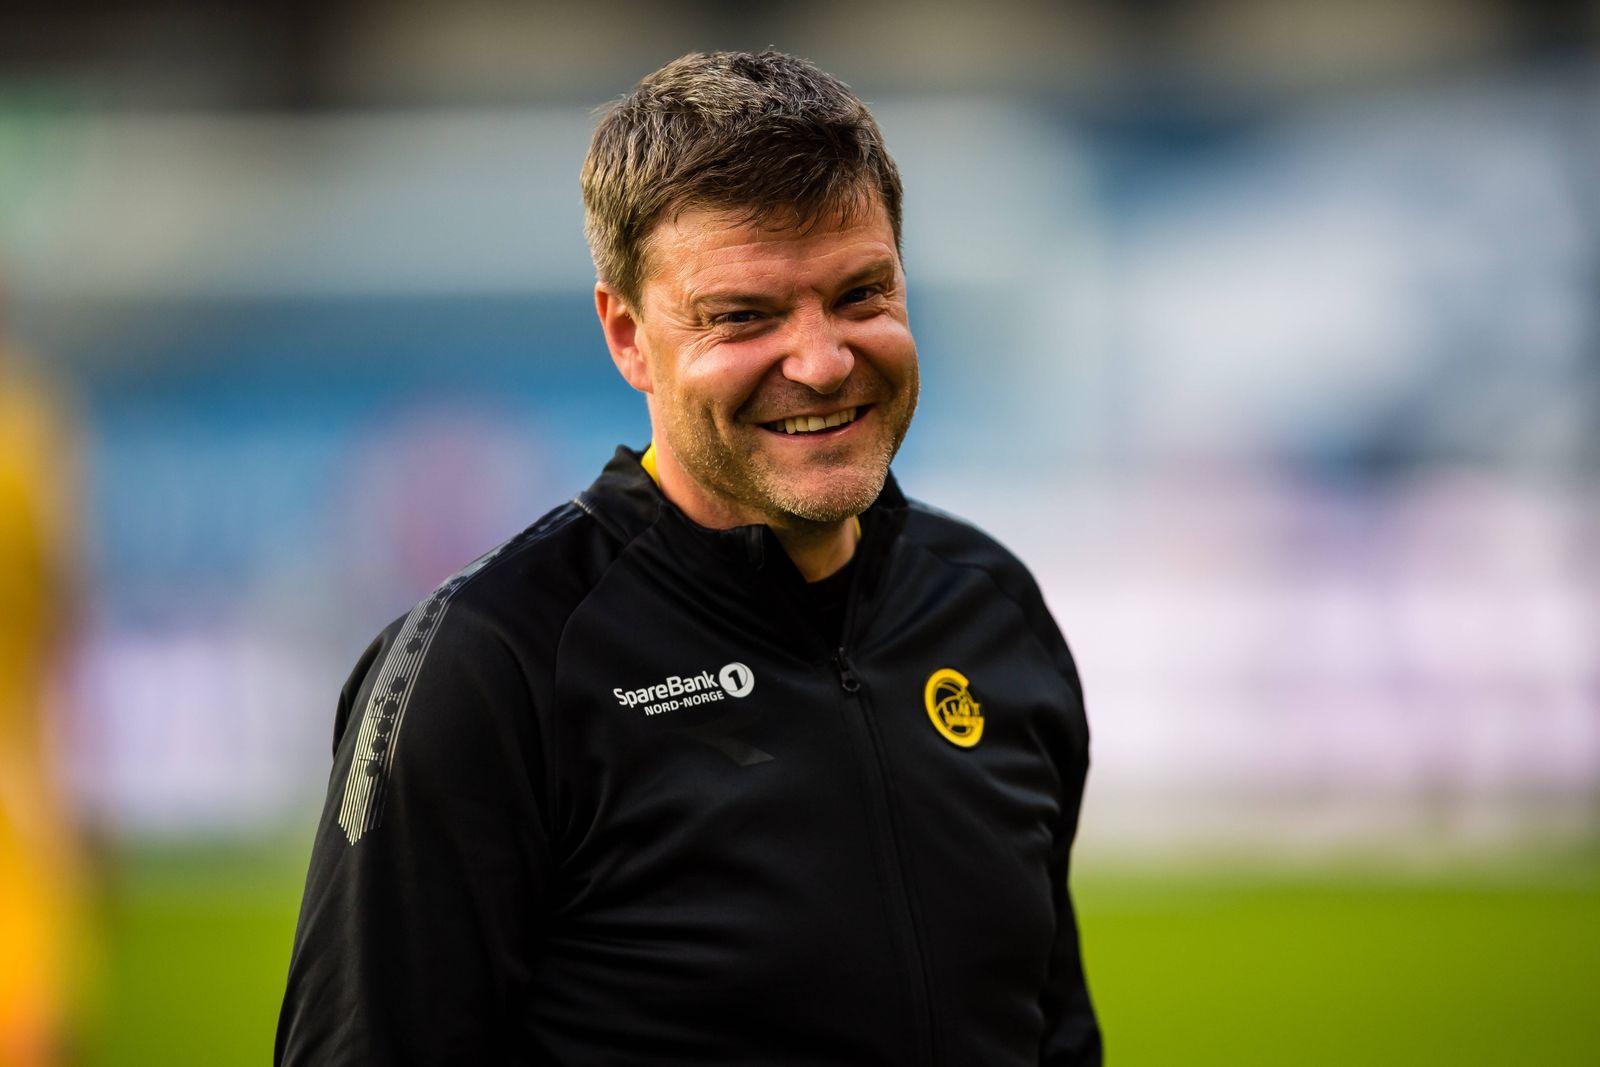 200625 Aasmund Karl Bjorkan, assistant coach of Bodo/Glimt, after the Eliteserien match between Rosenborg and Bodo/Glim